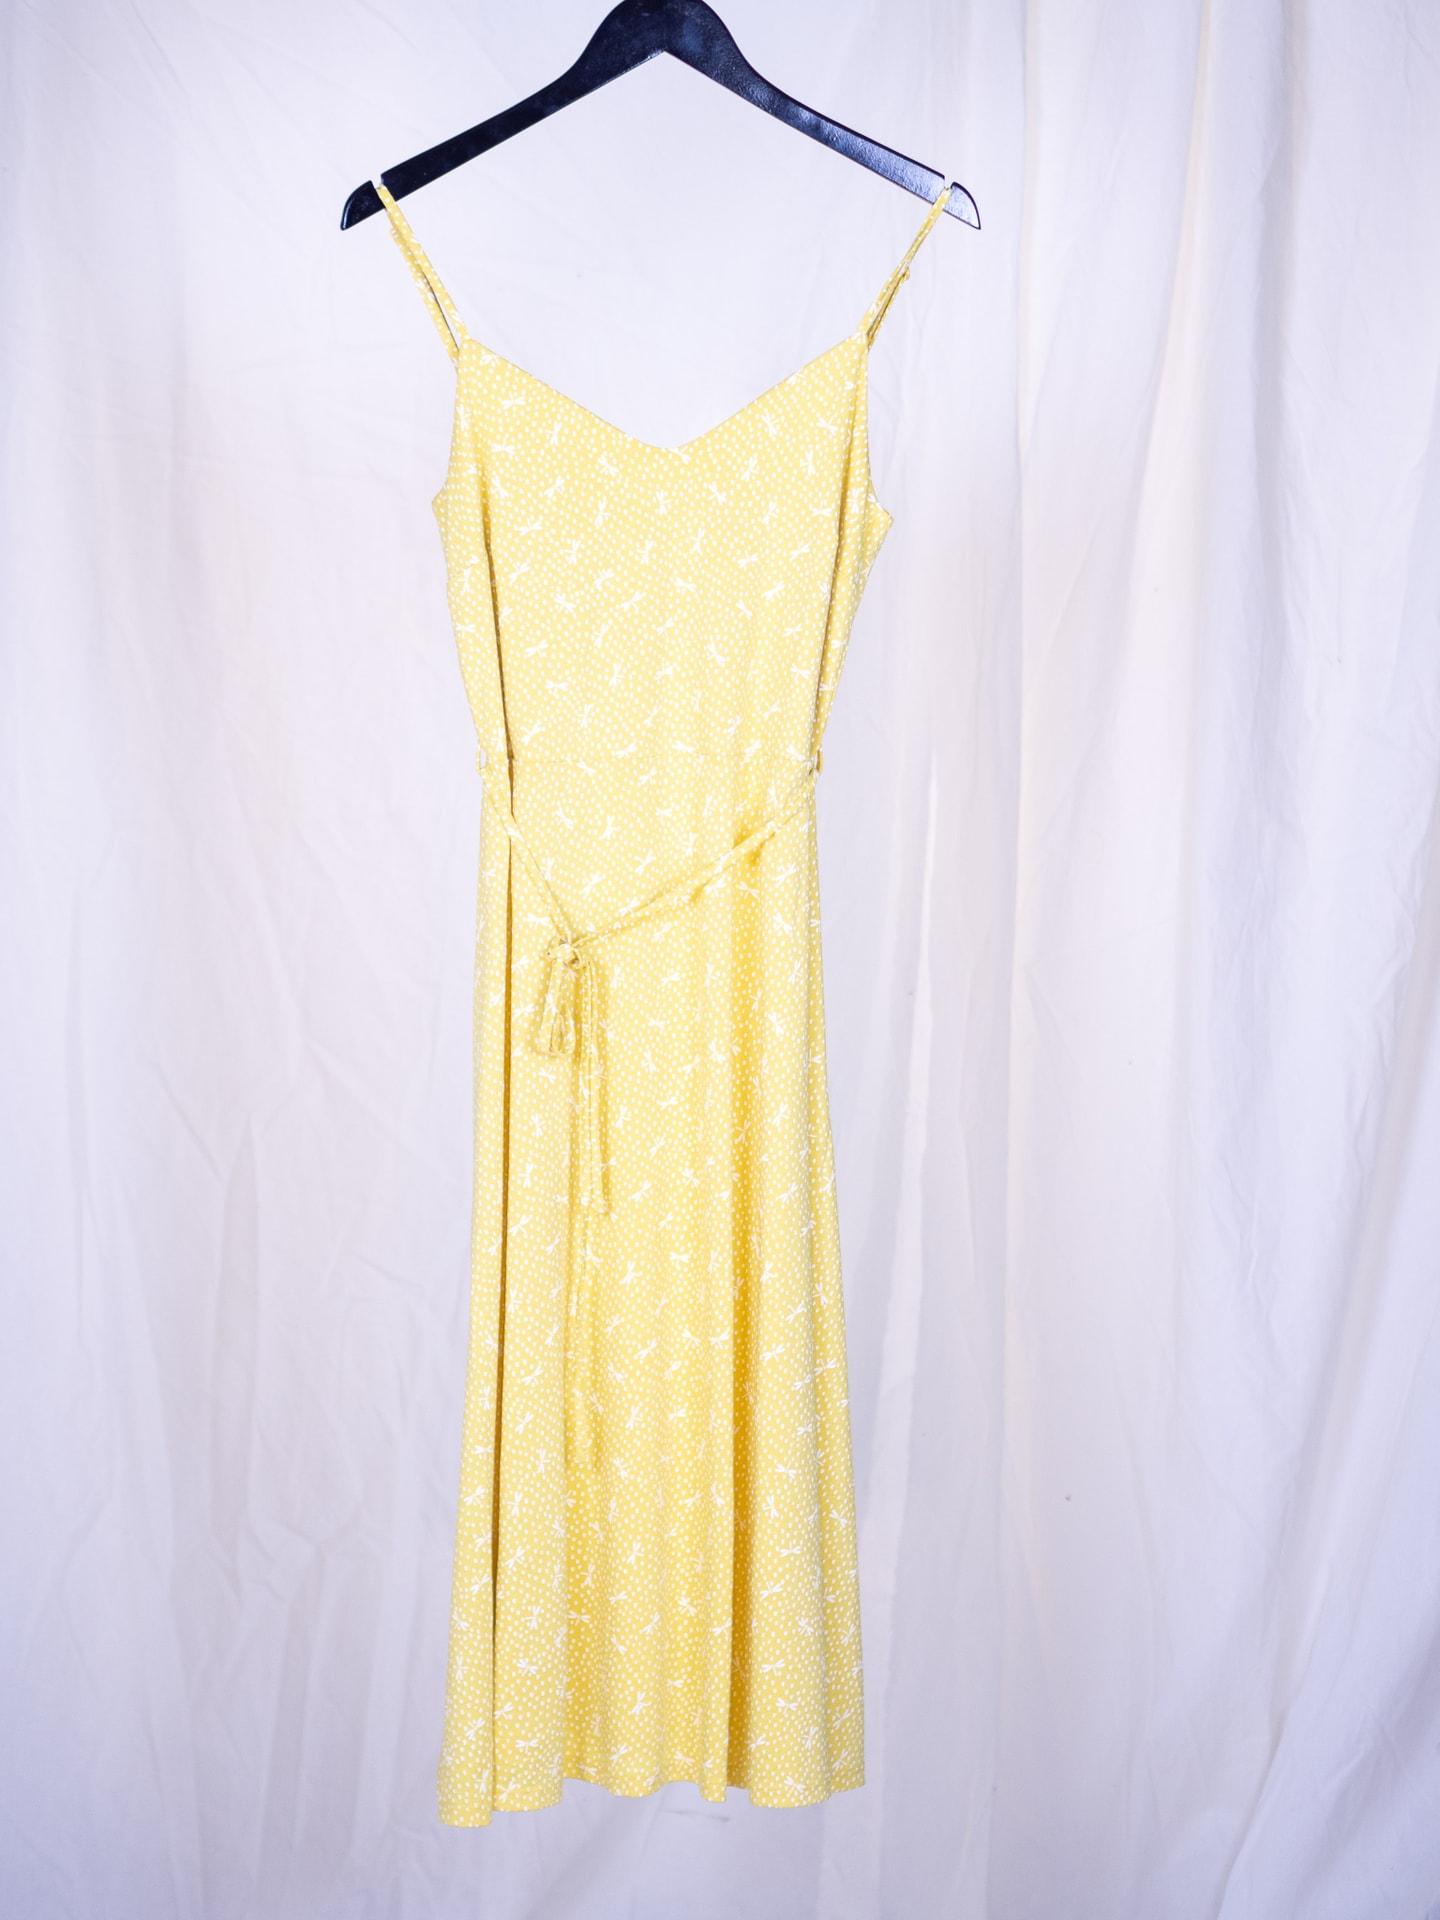 Jenna dragonfly dress